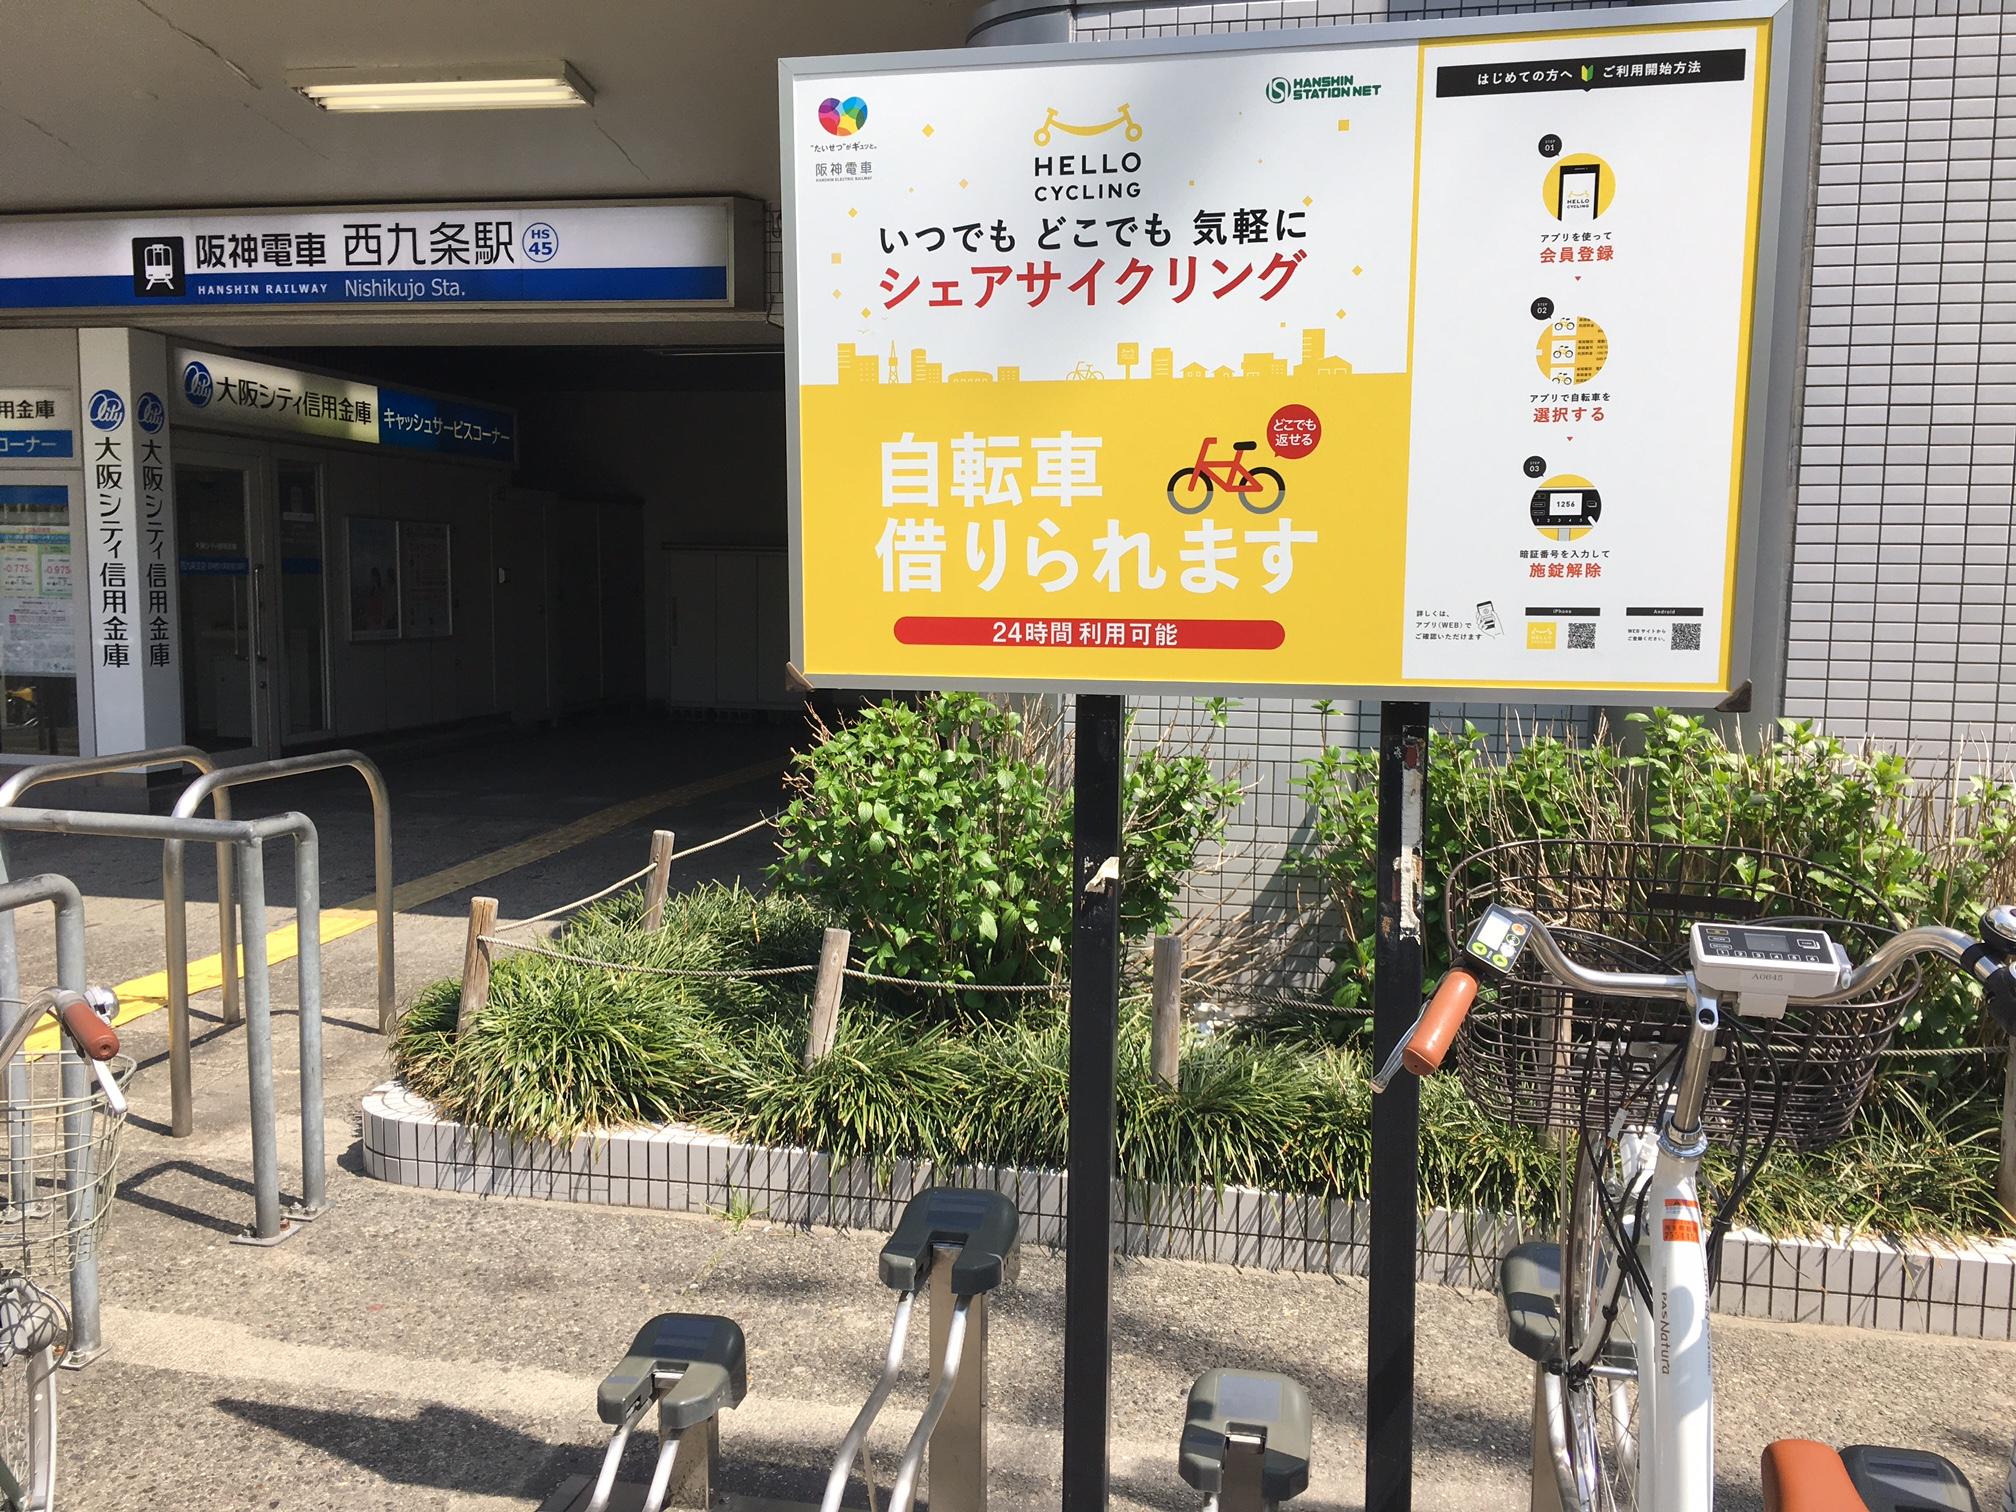 阪神西九条駅東棟B駐輪場 (HELLO CYCLING ポート) image